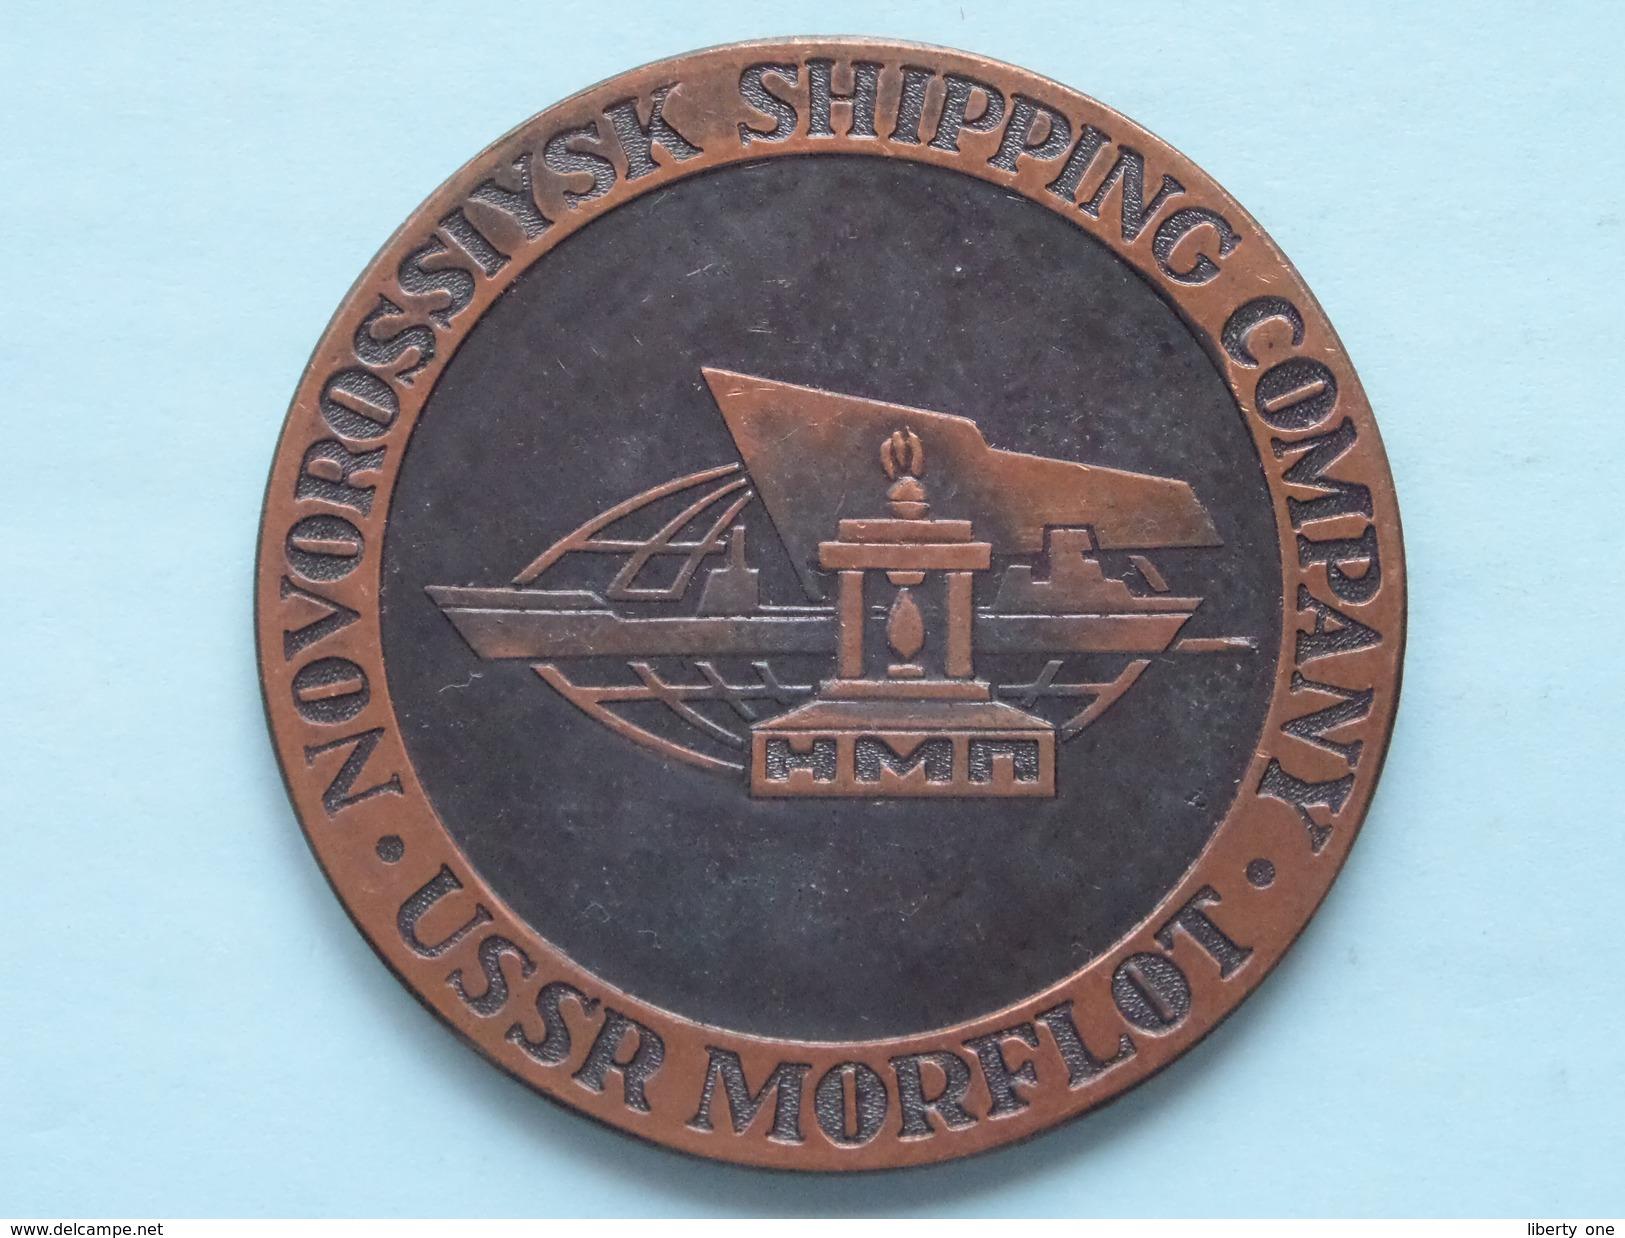 USSR MORFLOT - NOVOROSSIYSKSHIPPING COMPANY ( Details Zie Foto's - 70 Gr. / 60 Mm.) U.S.S.R. ! - Autres